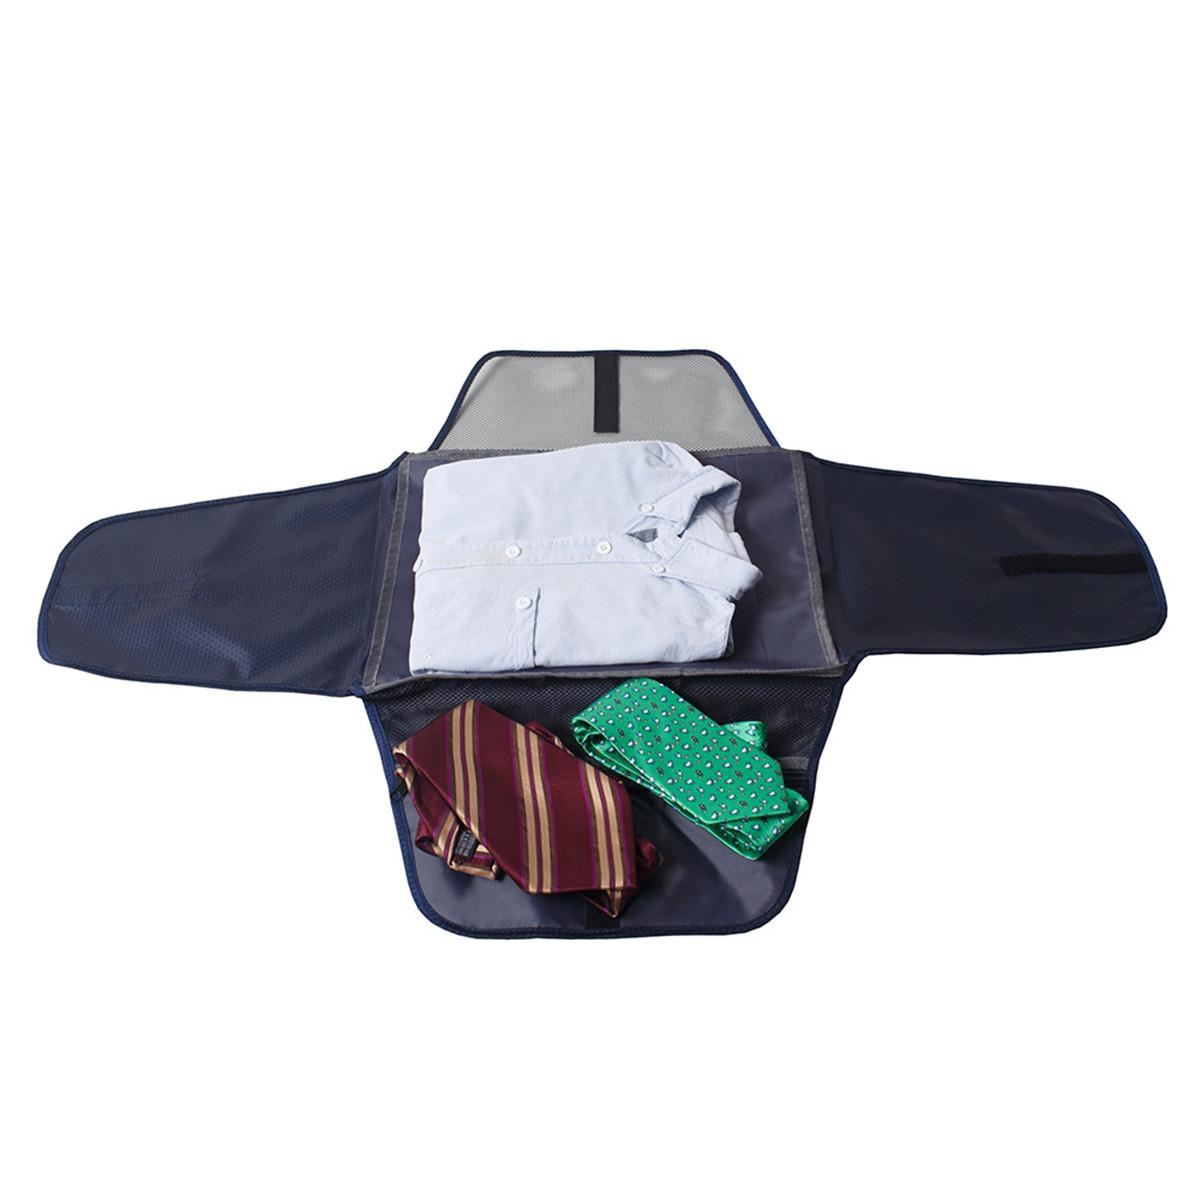 Travel Luggage Organizer Anti-wrinkle Shirt Garment Clothing Storage Folder Suitcase Packing Bag